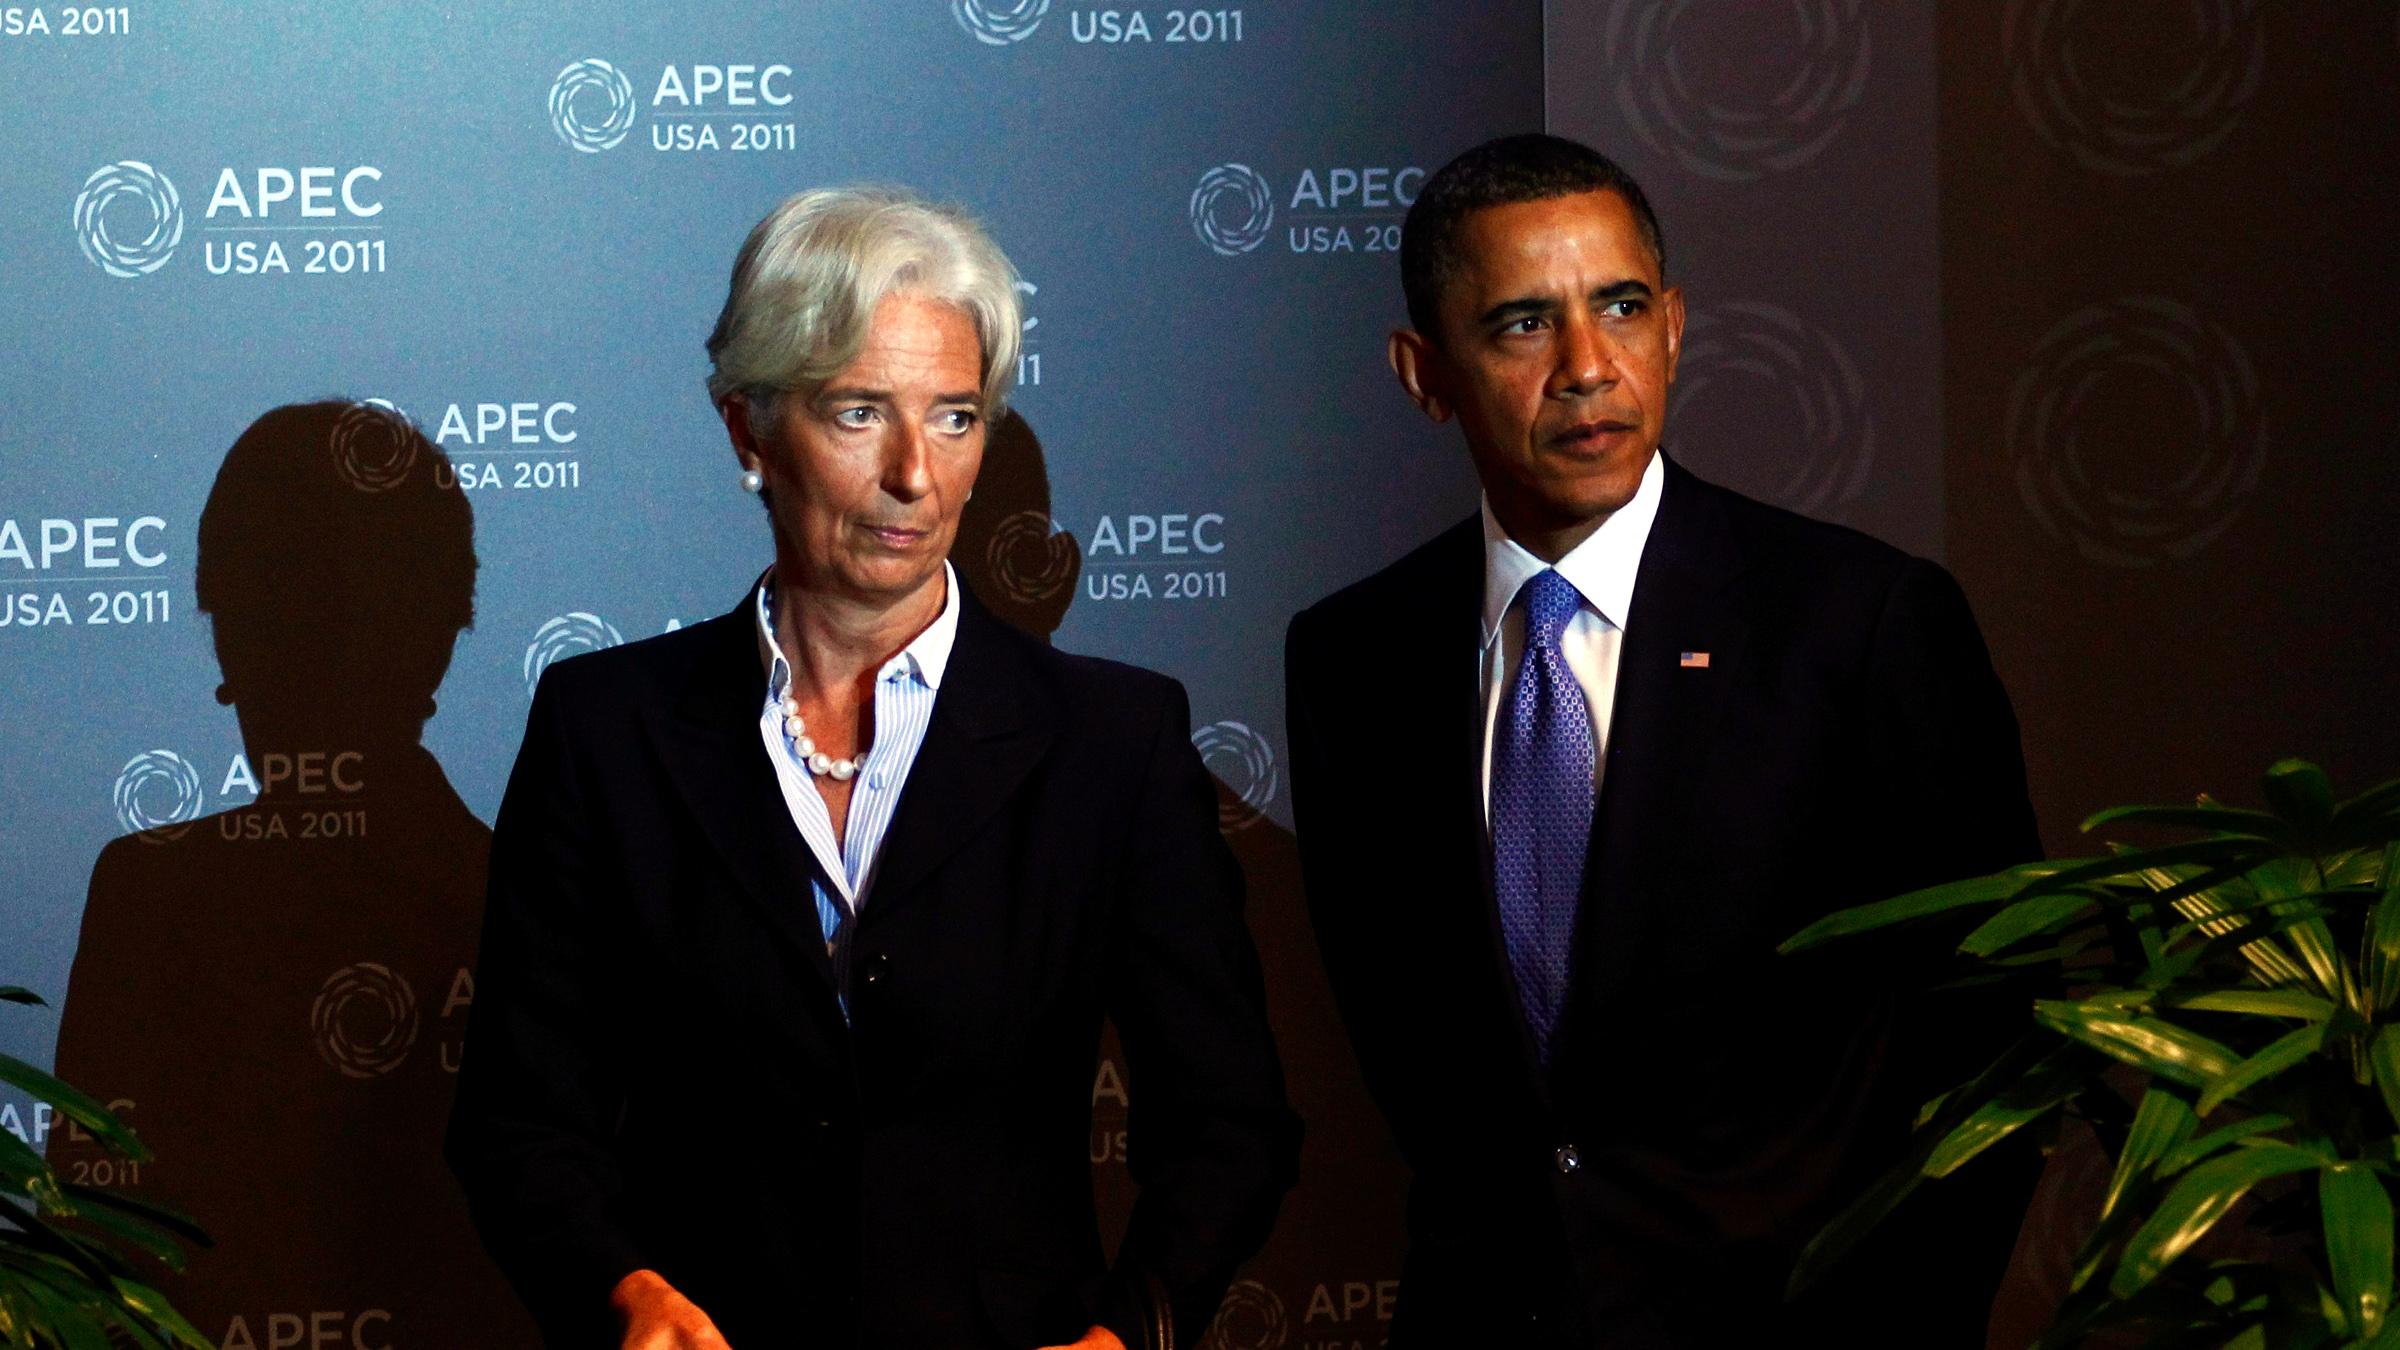 International Monetary Fund (IMF) Director Christine Lagarde (L) and U.S. President Barack Obama arrive for the first plenary meeting at the APEC Summit in Honolulu, Hawaii November 13, 2011.